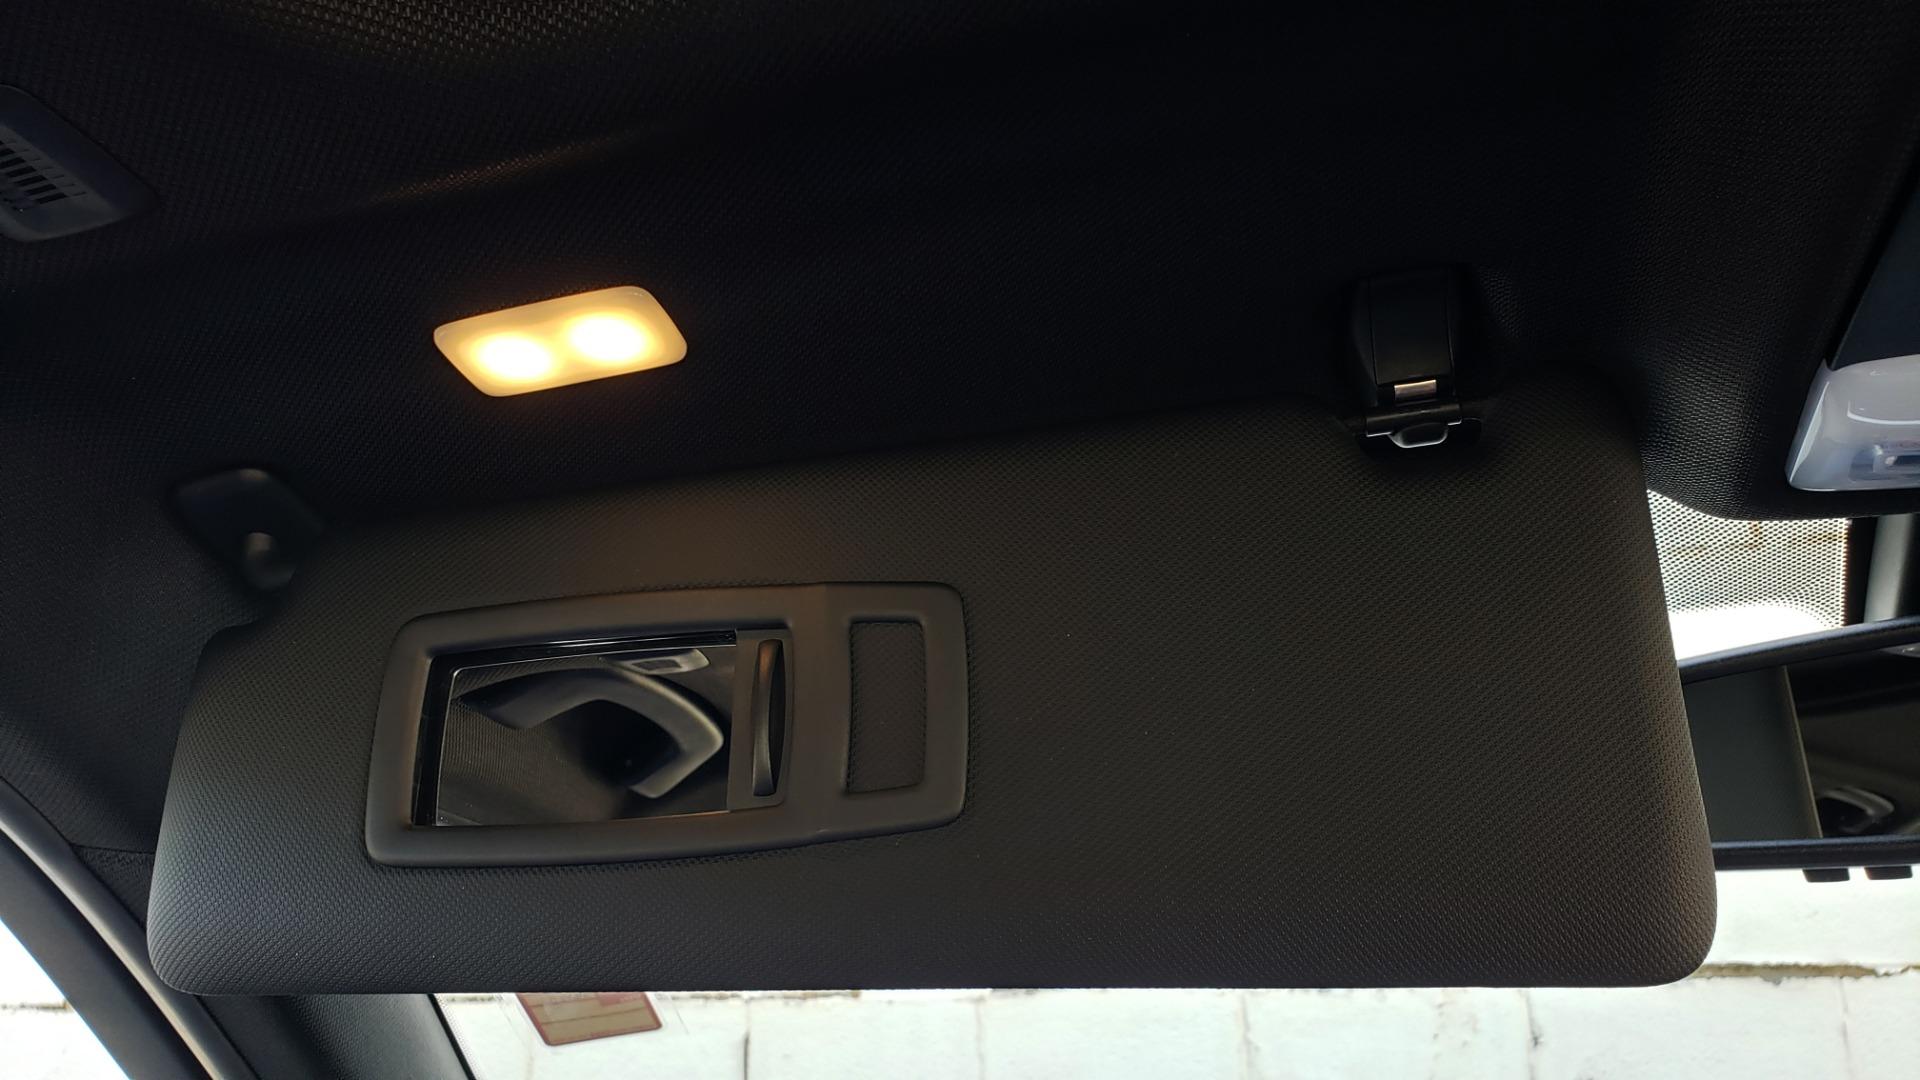 Used 2017 BMW 3 SERIES 330I SPORT SEDAN / DRVR ASST PKG / SUNROOF / REARVIEW for sale Sold at Formula Imports in Charlotte NC 28227 52